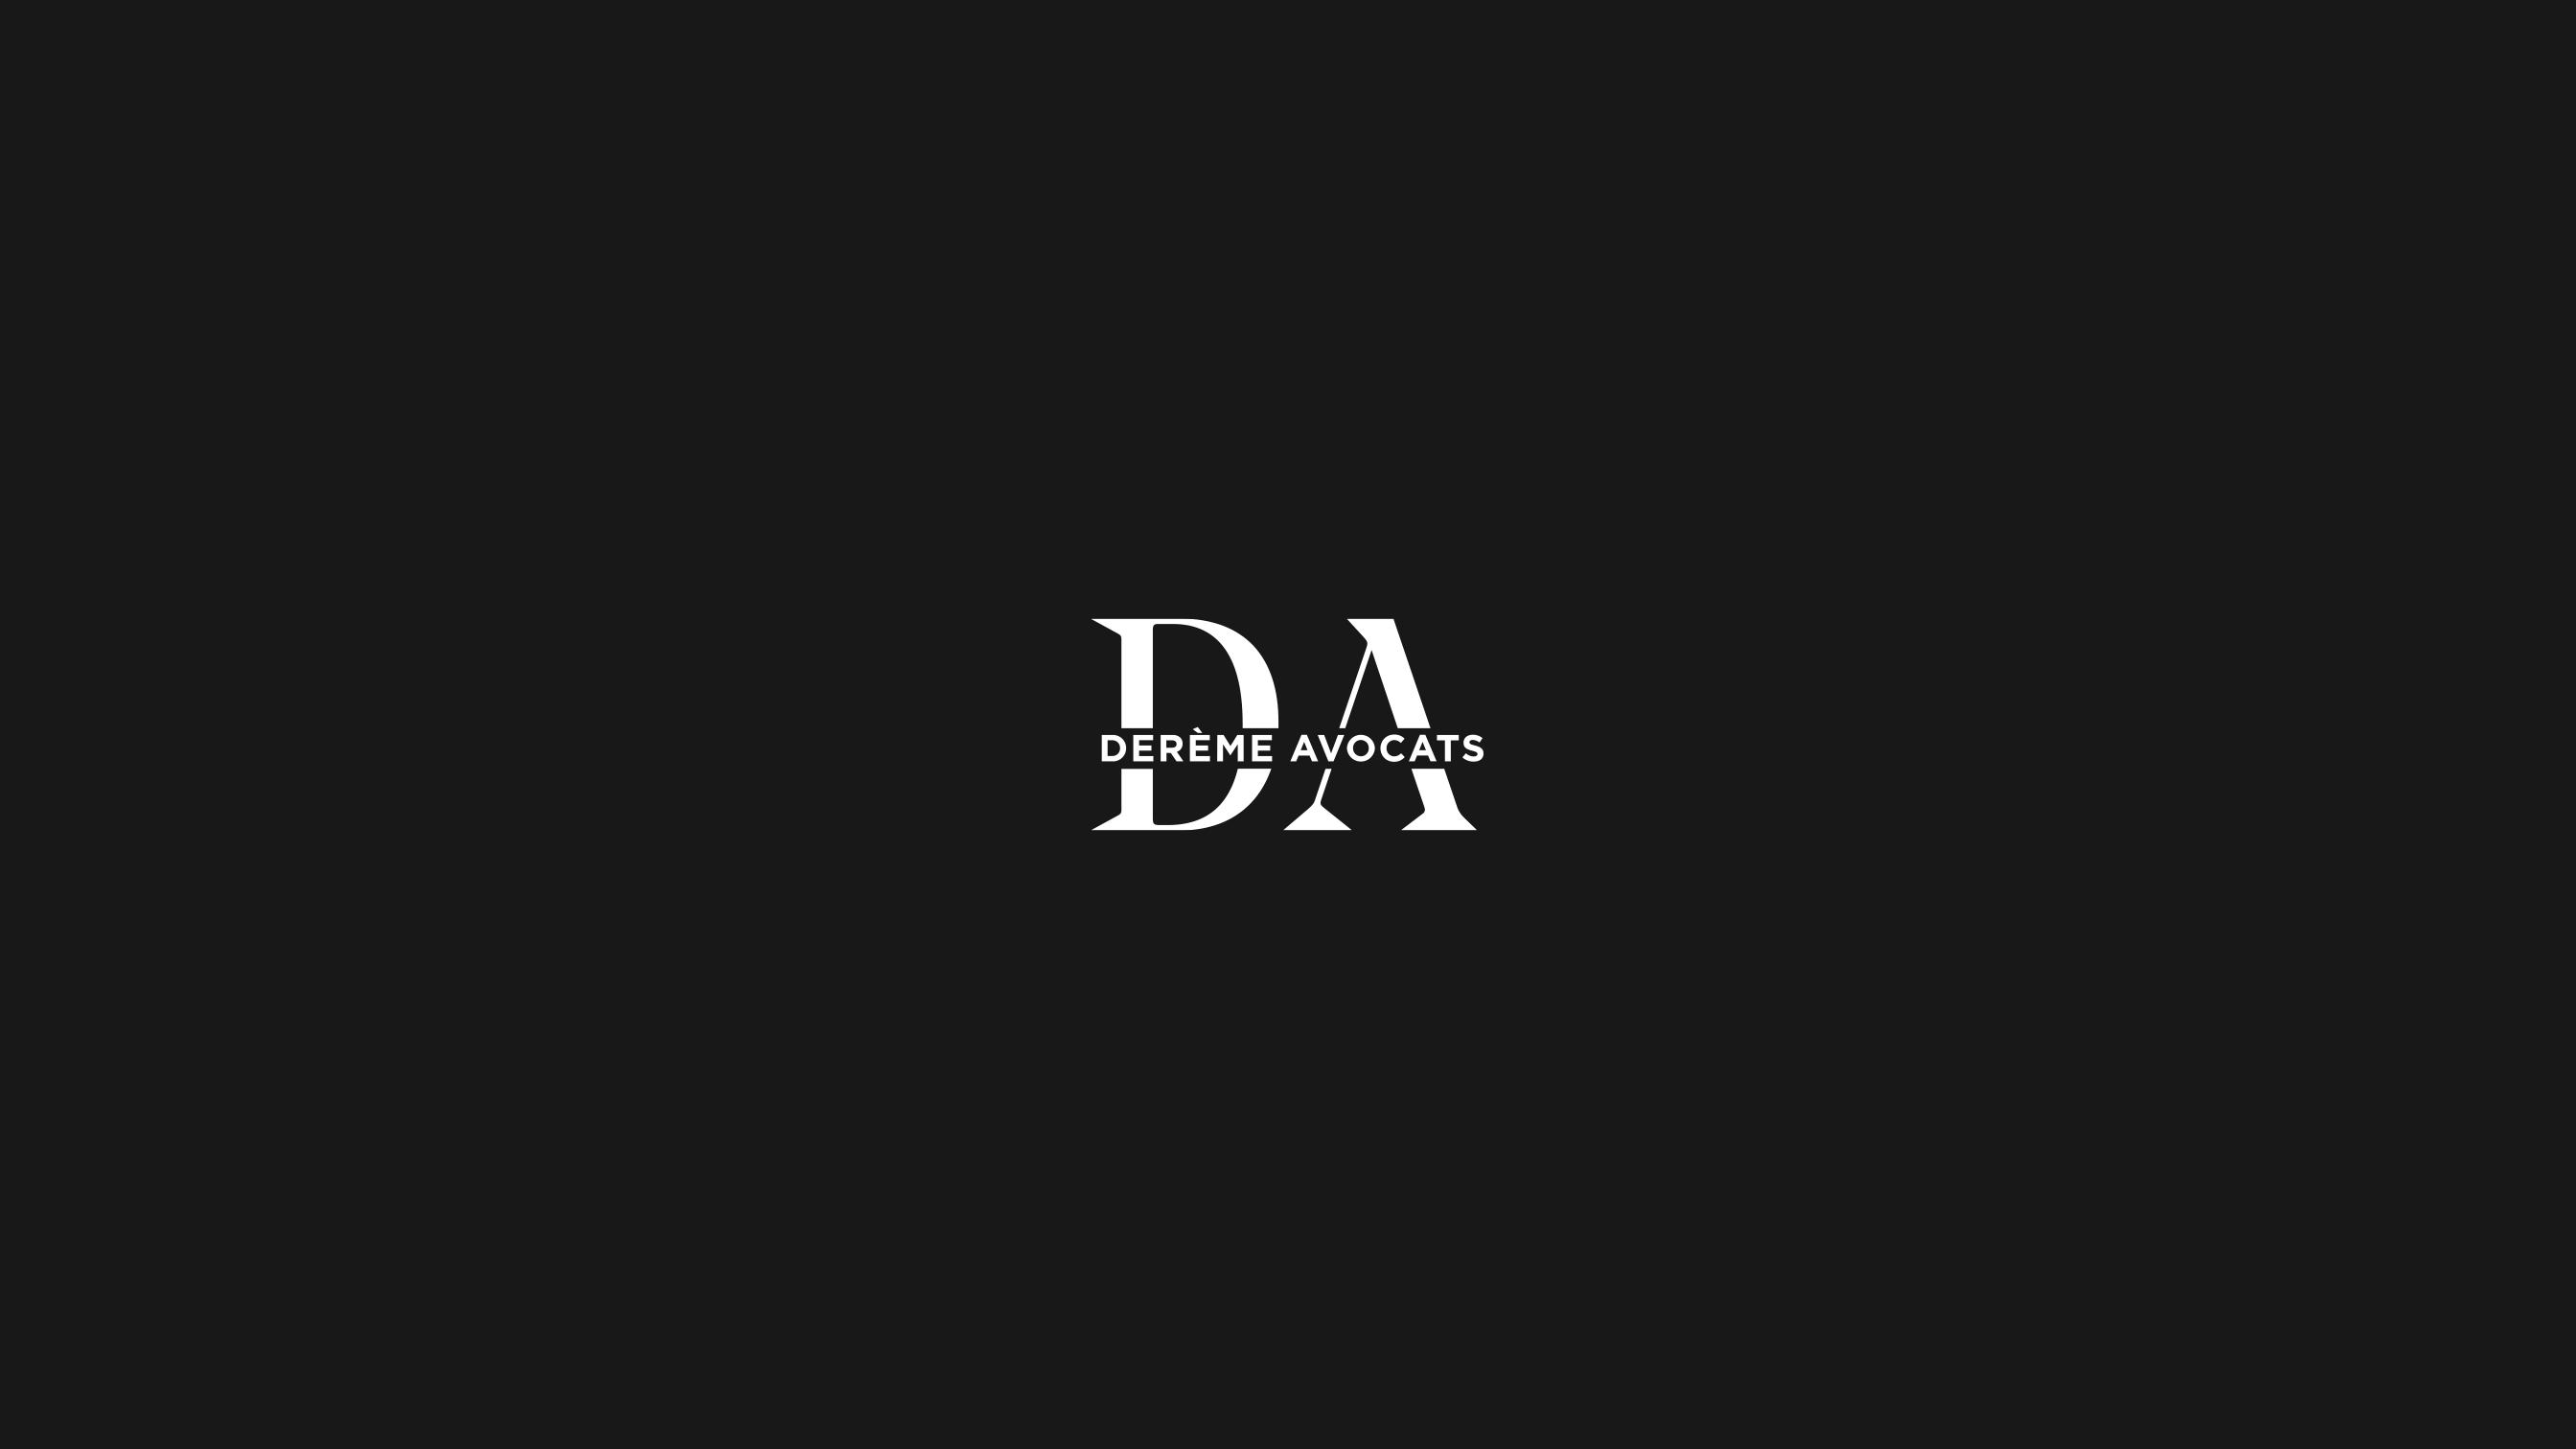 showcase-logotype-dereme-avocats